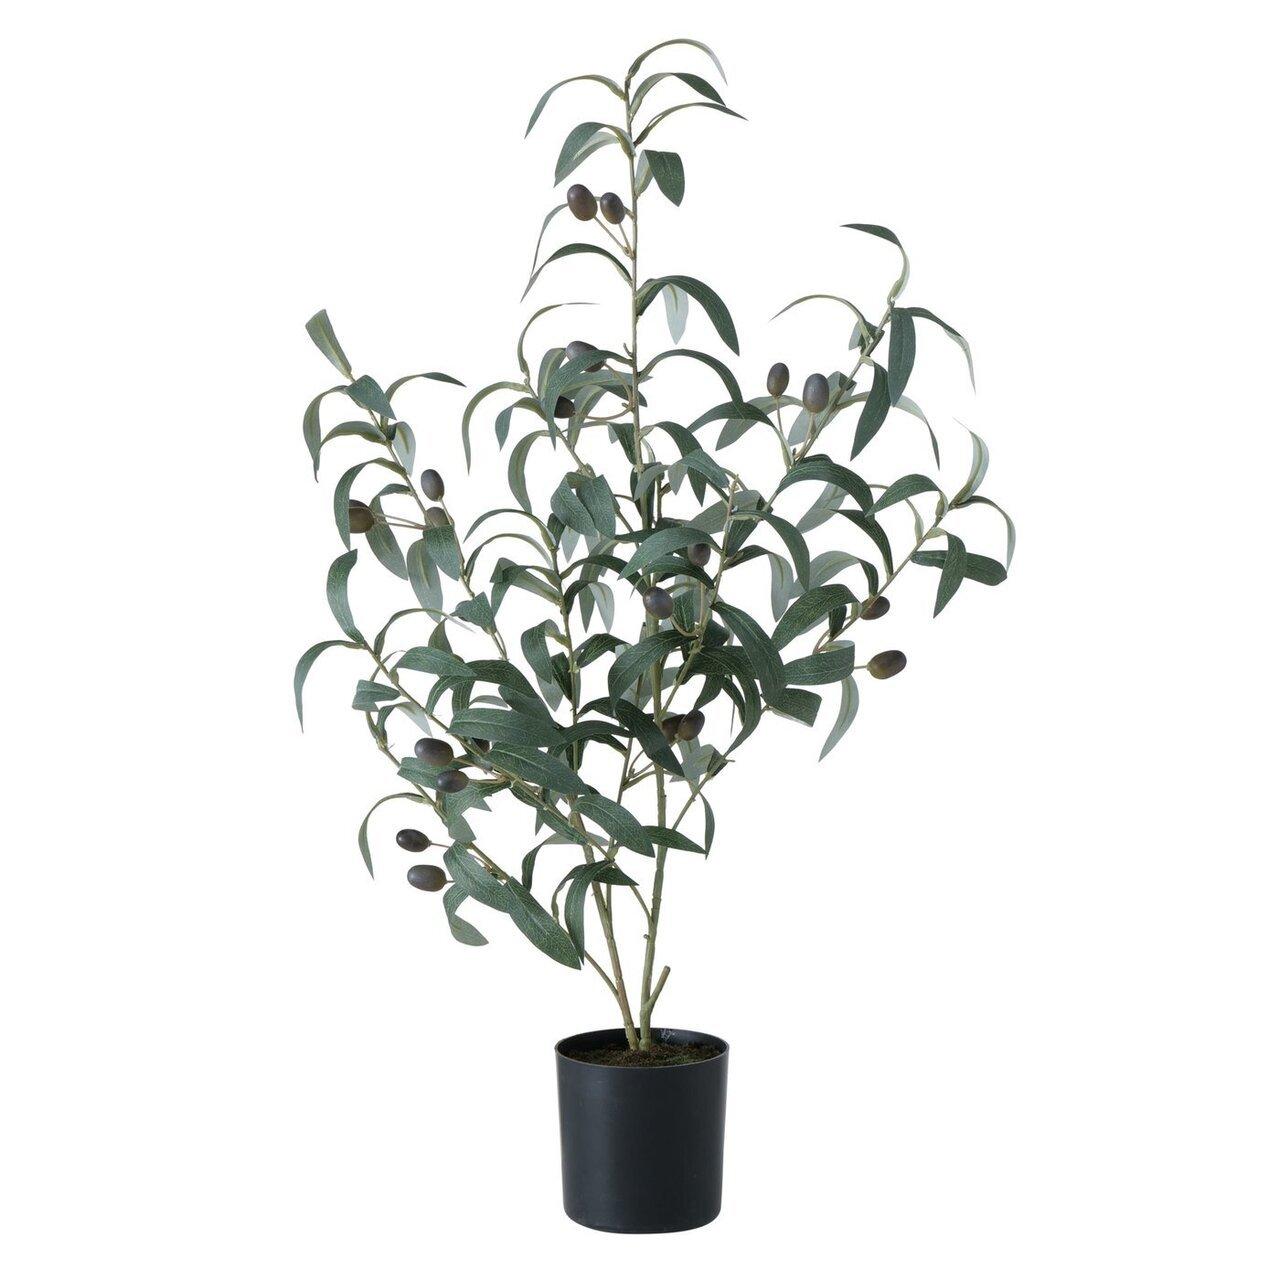 Boltze Olivenbaum Kunstpflanze